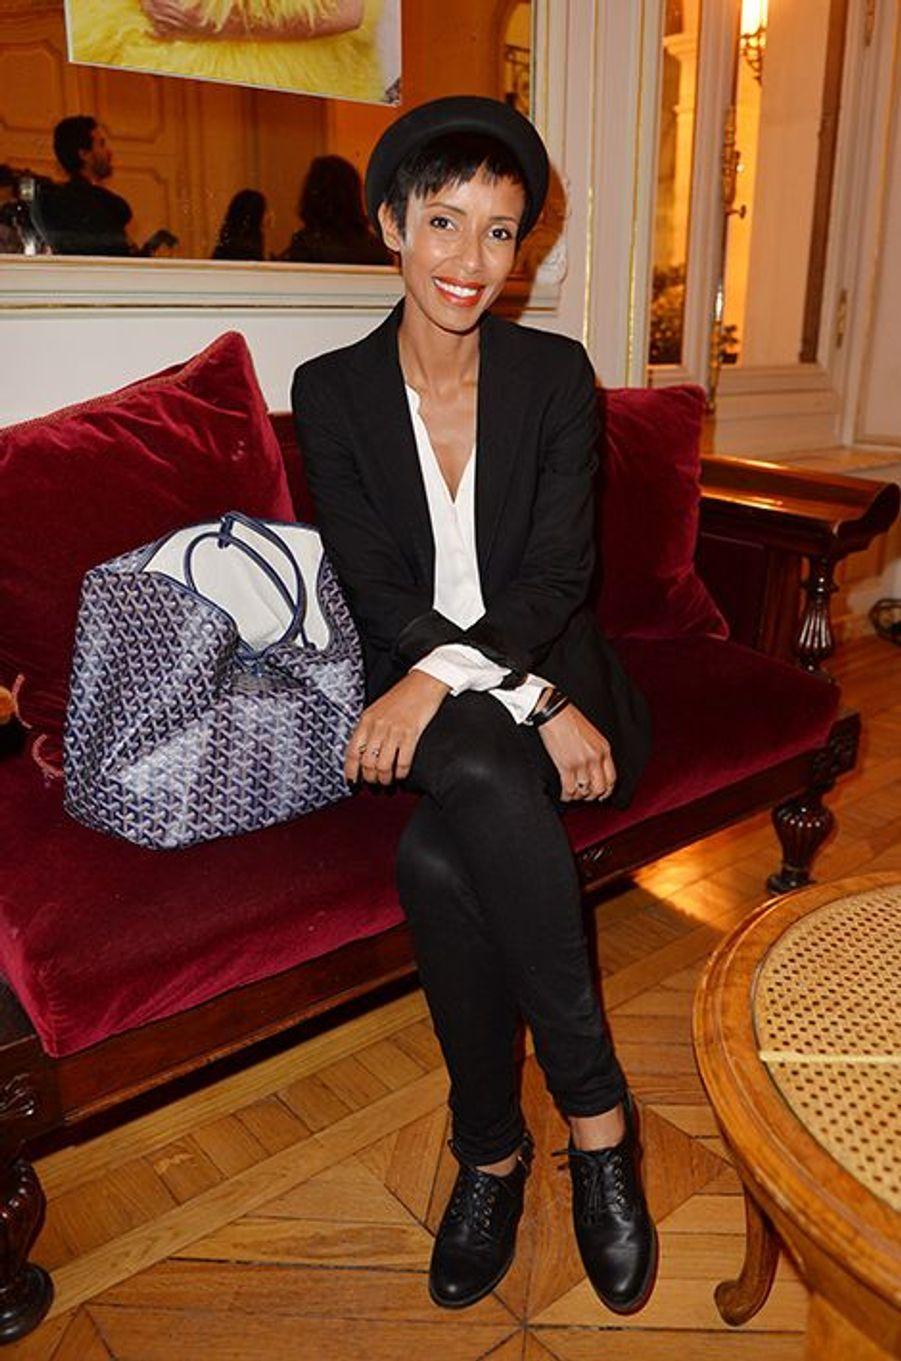 Sonia Rolland à l'hôtel Régina de Paris le lundi 13 octobre 2014